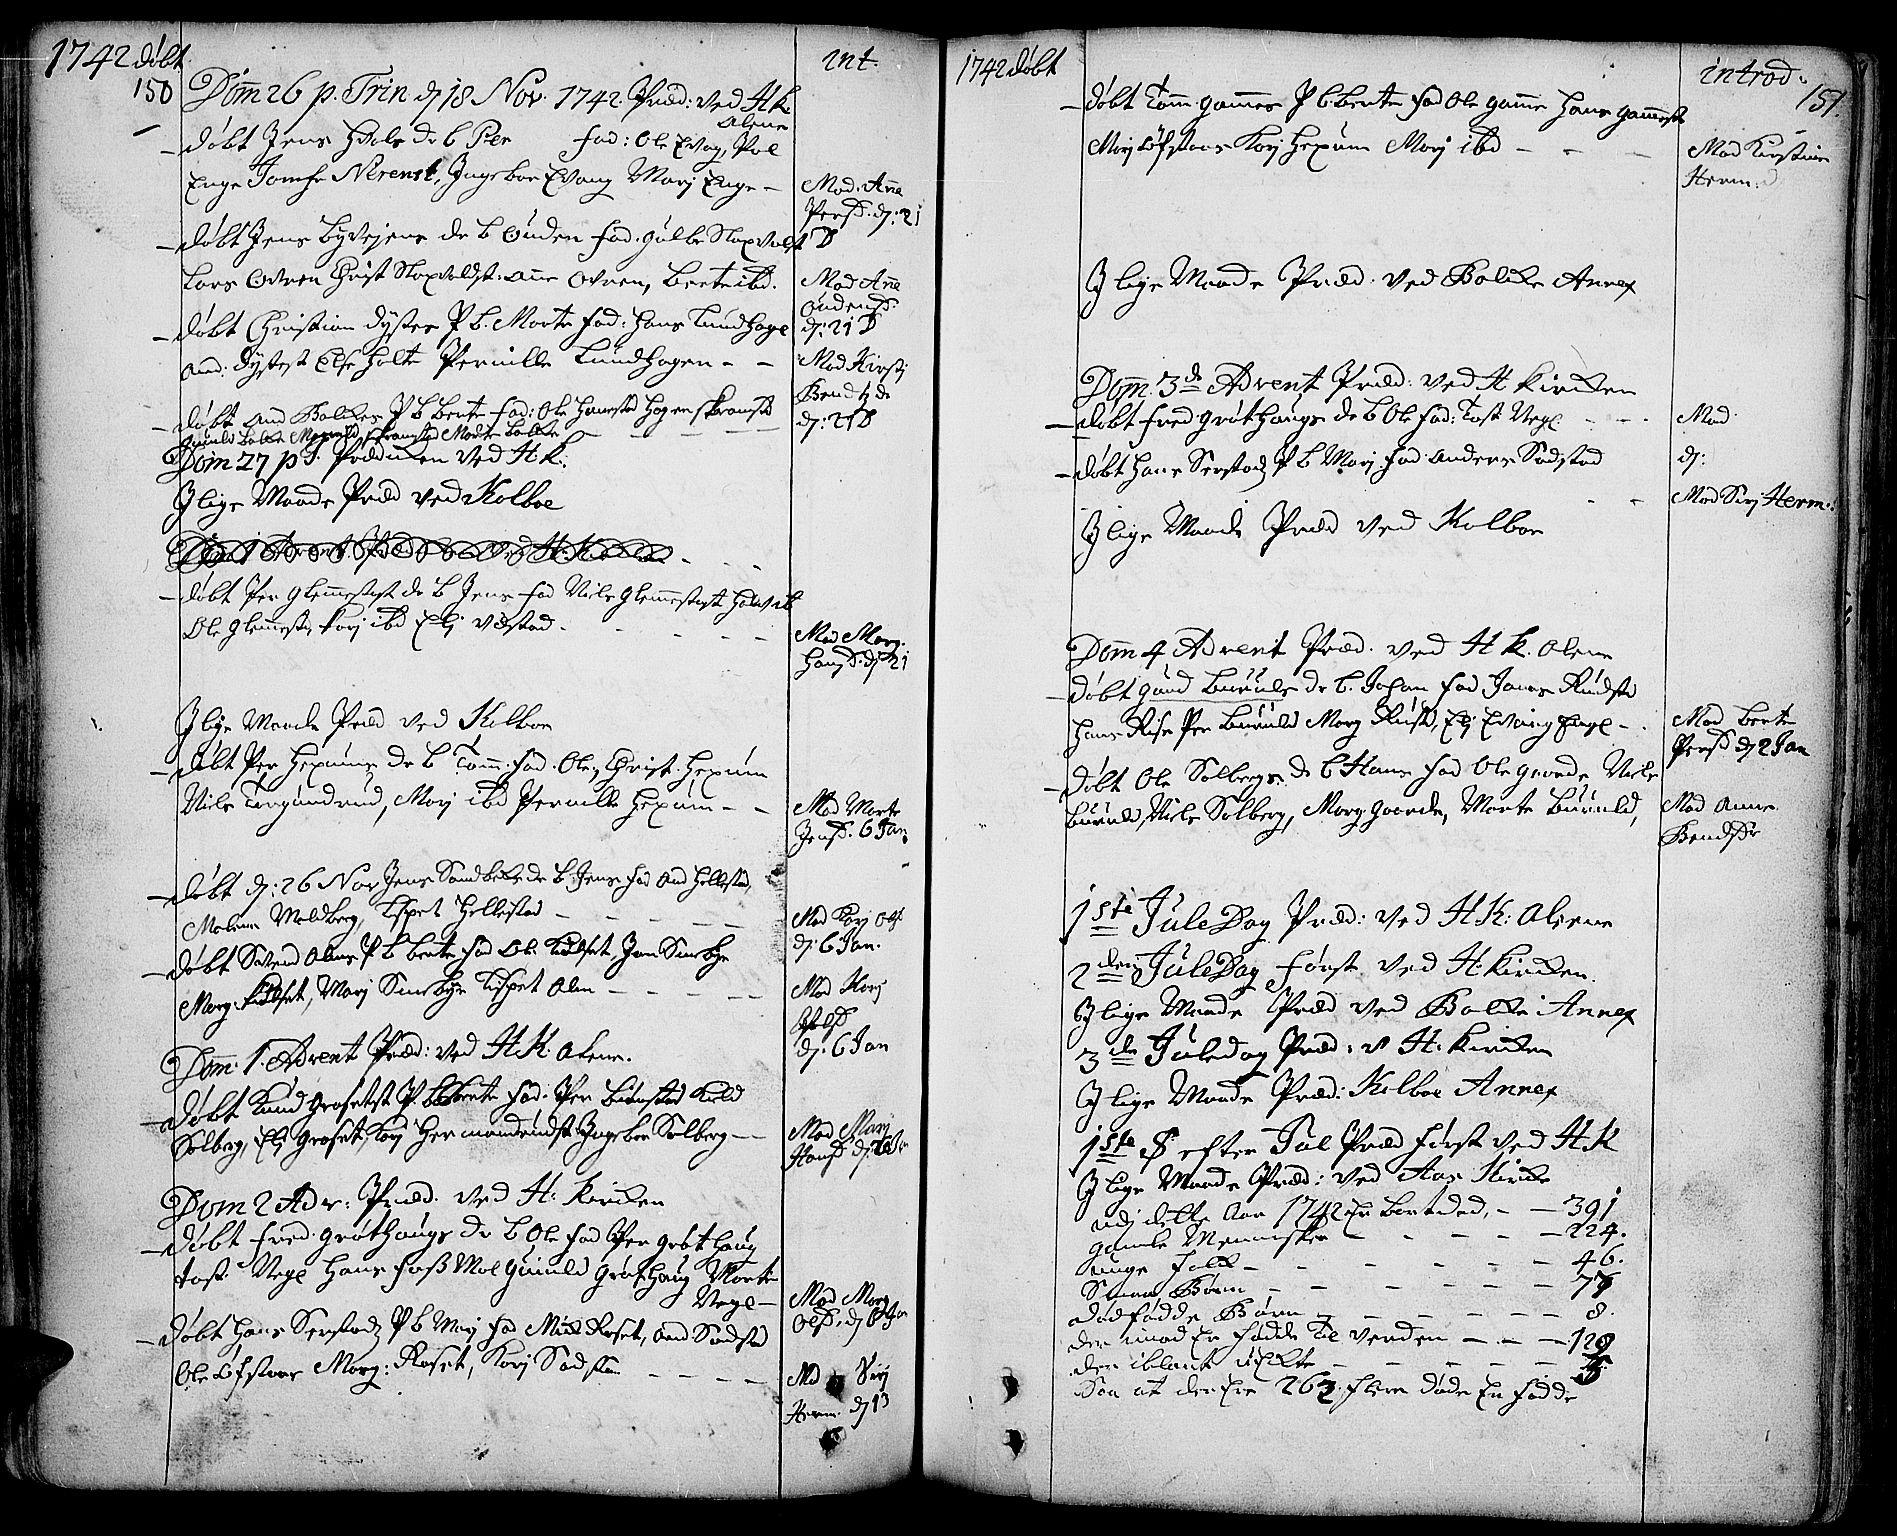 SAH, Toten prestekontor, Ministerialbok nr. 3, 1734-1751, s. 150-151